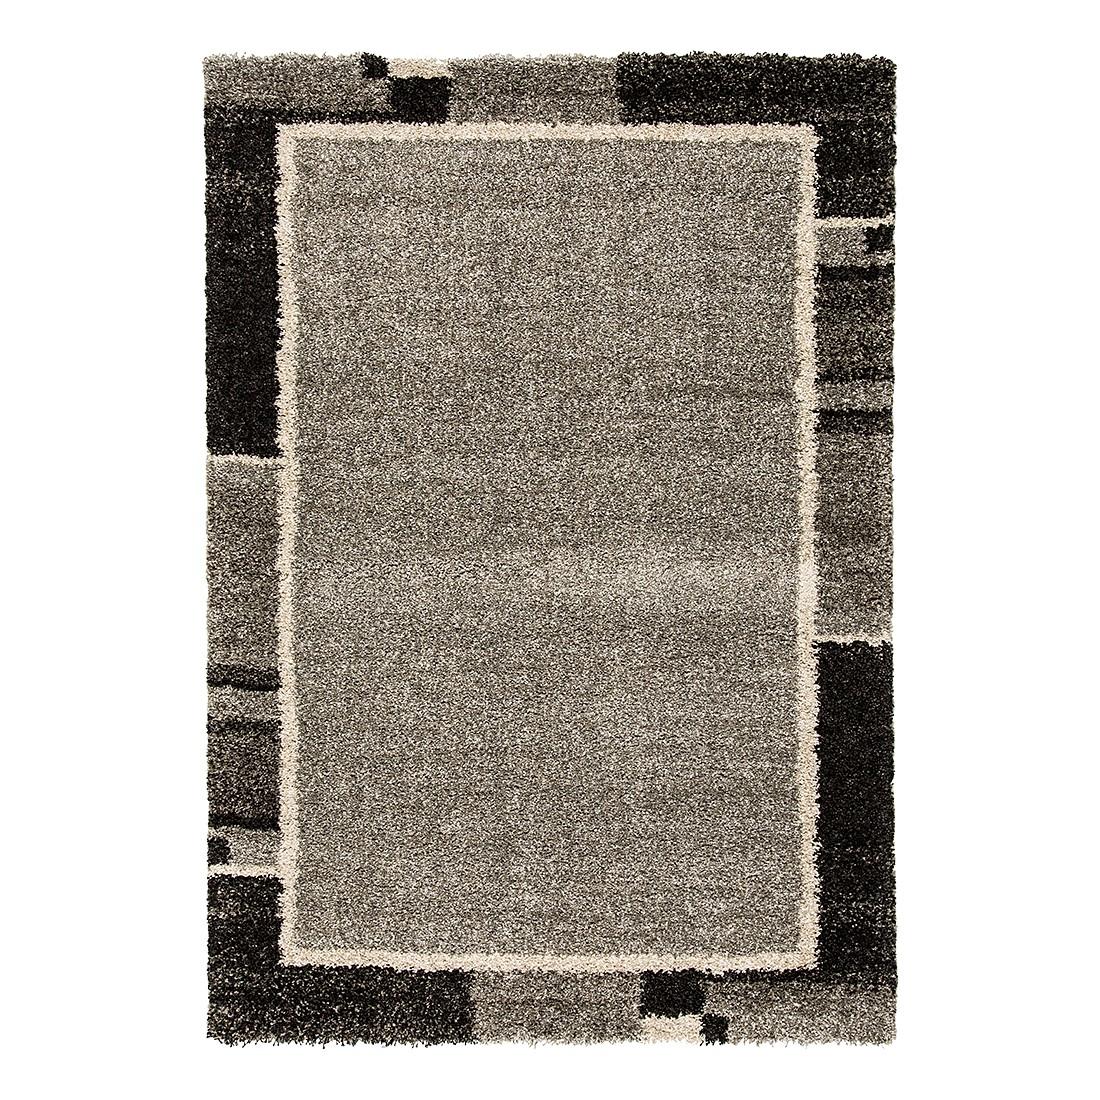 Teppich Design Gewebt – Grau – 200cm x 290cm, Home24Deko kaufen